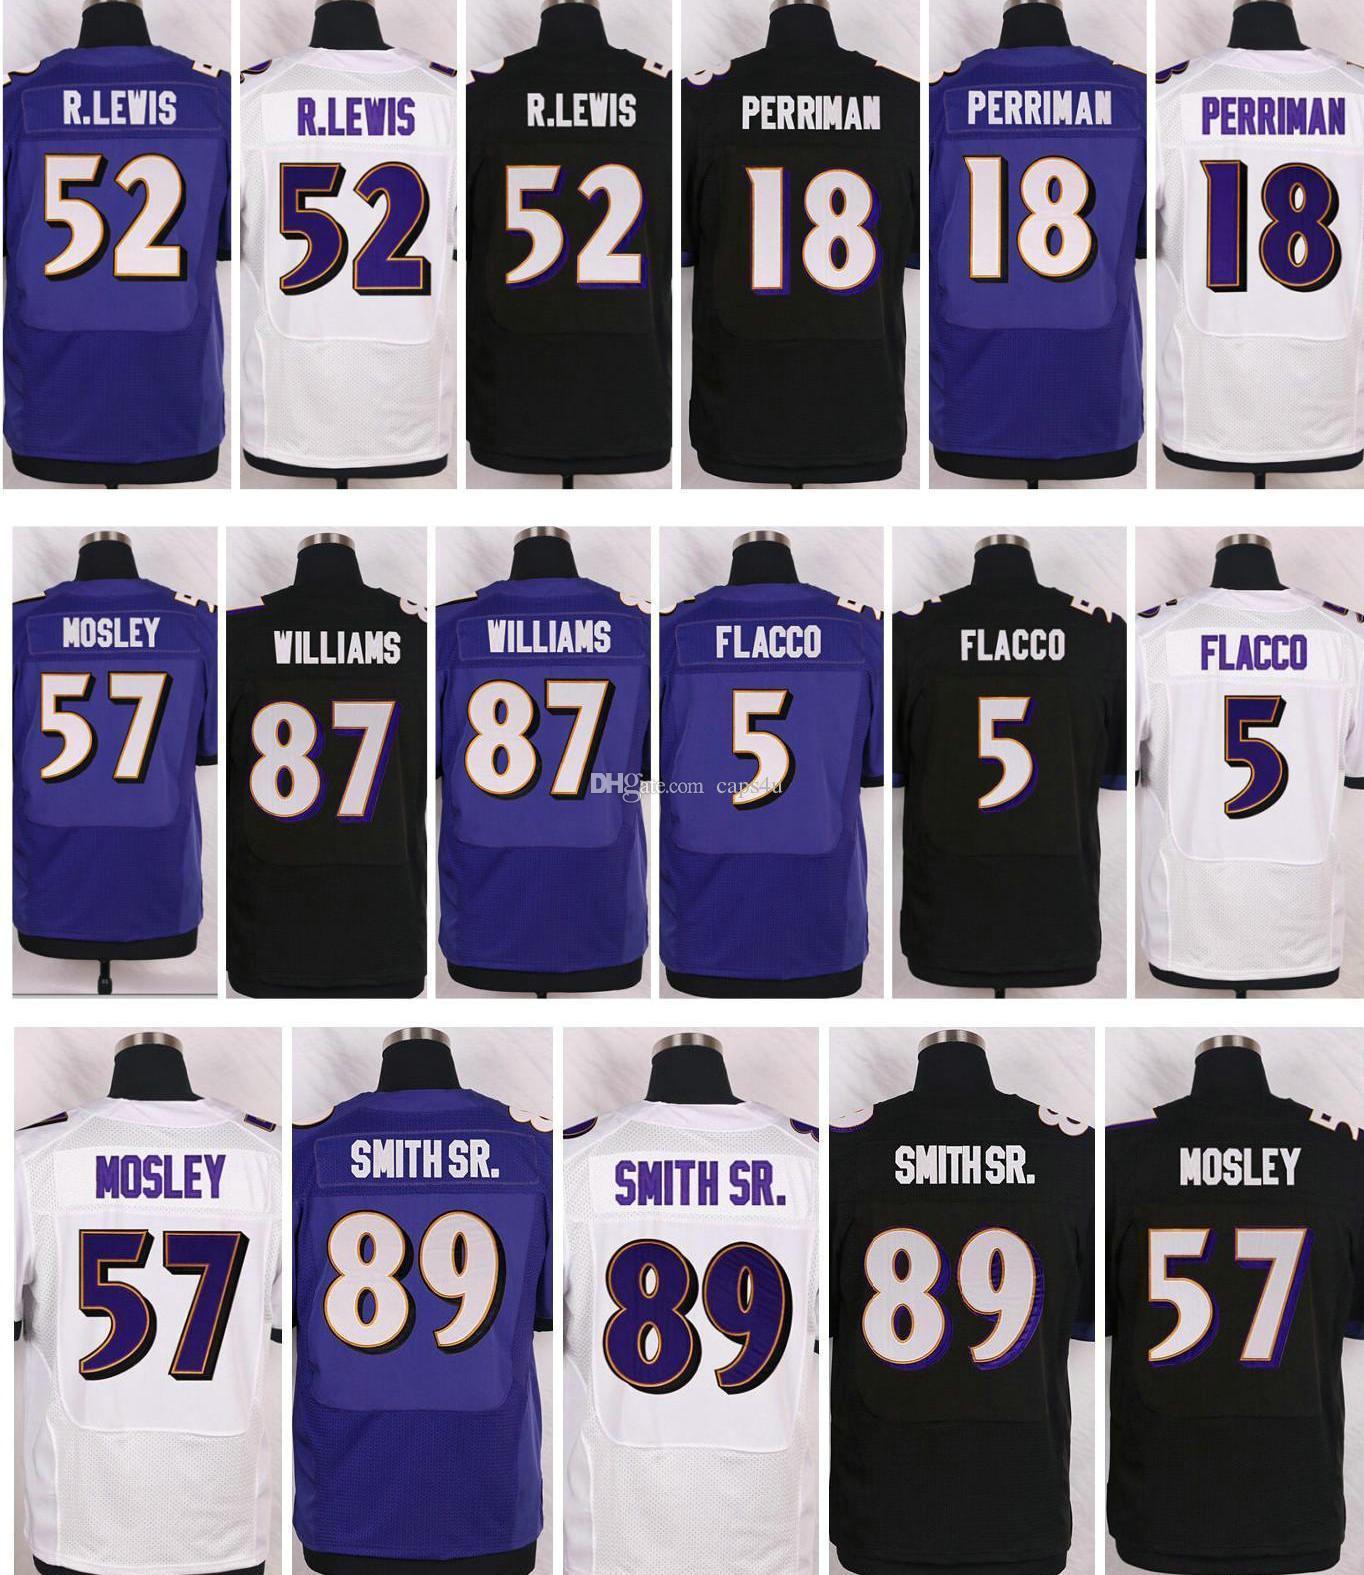 Real Real Jersey Ravens Ravens